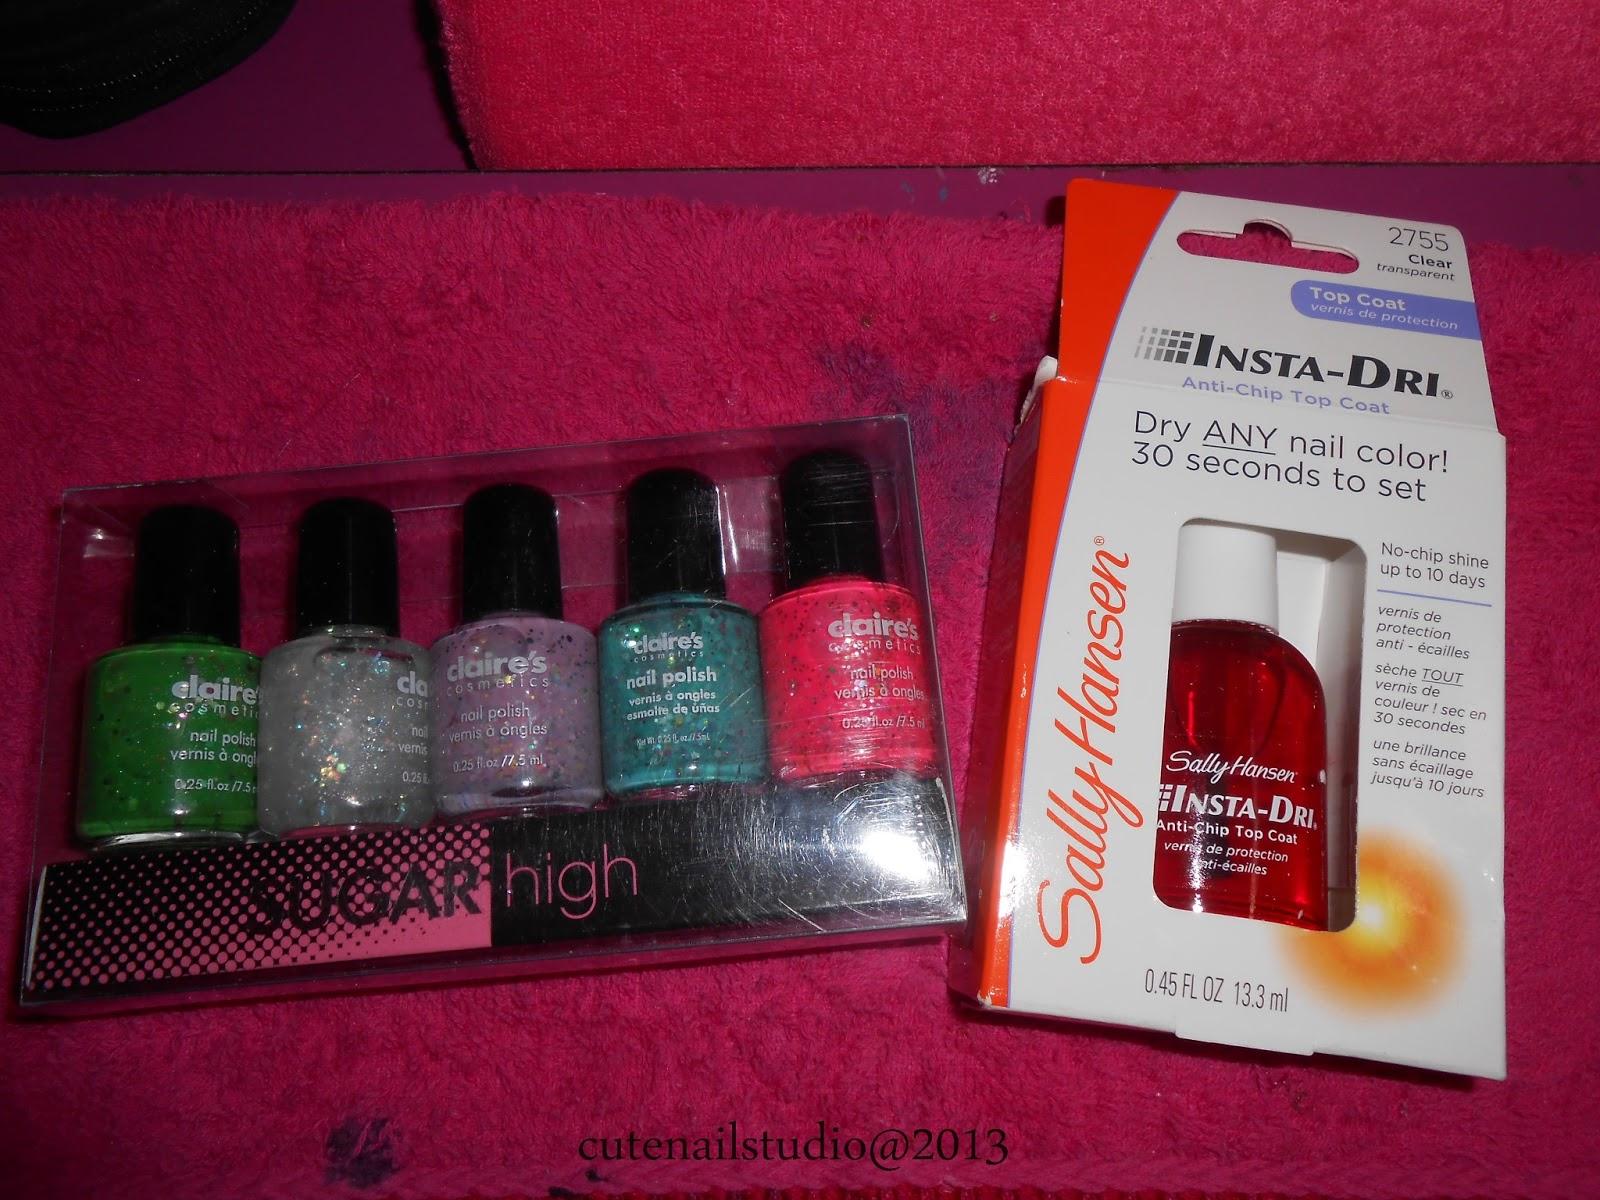 Cute nails: My polish haul